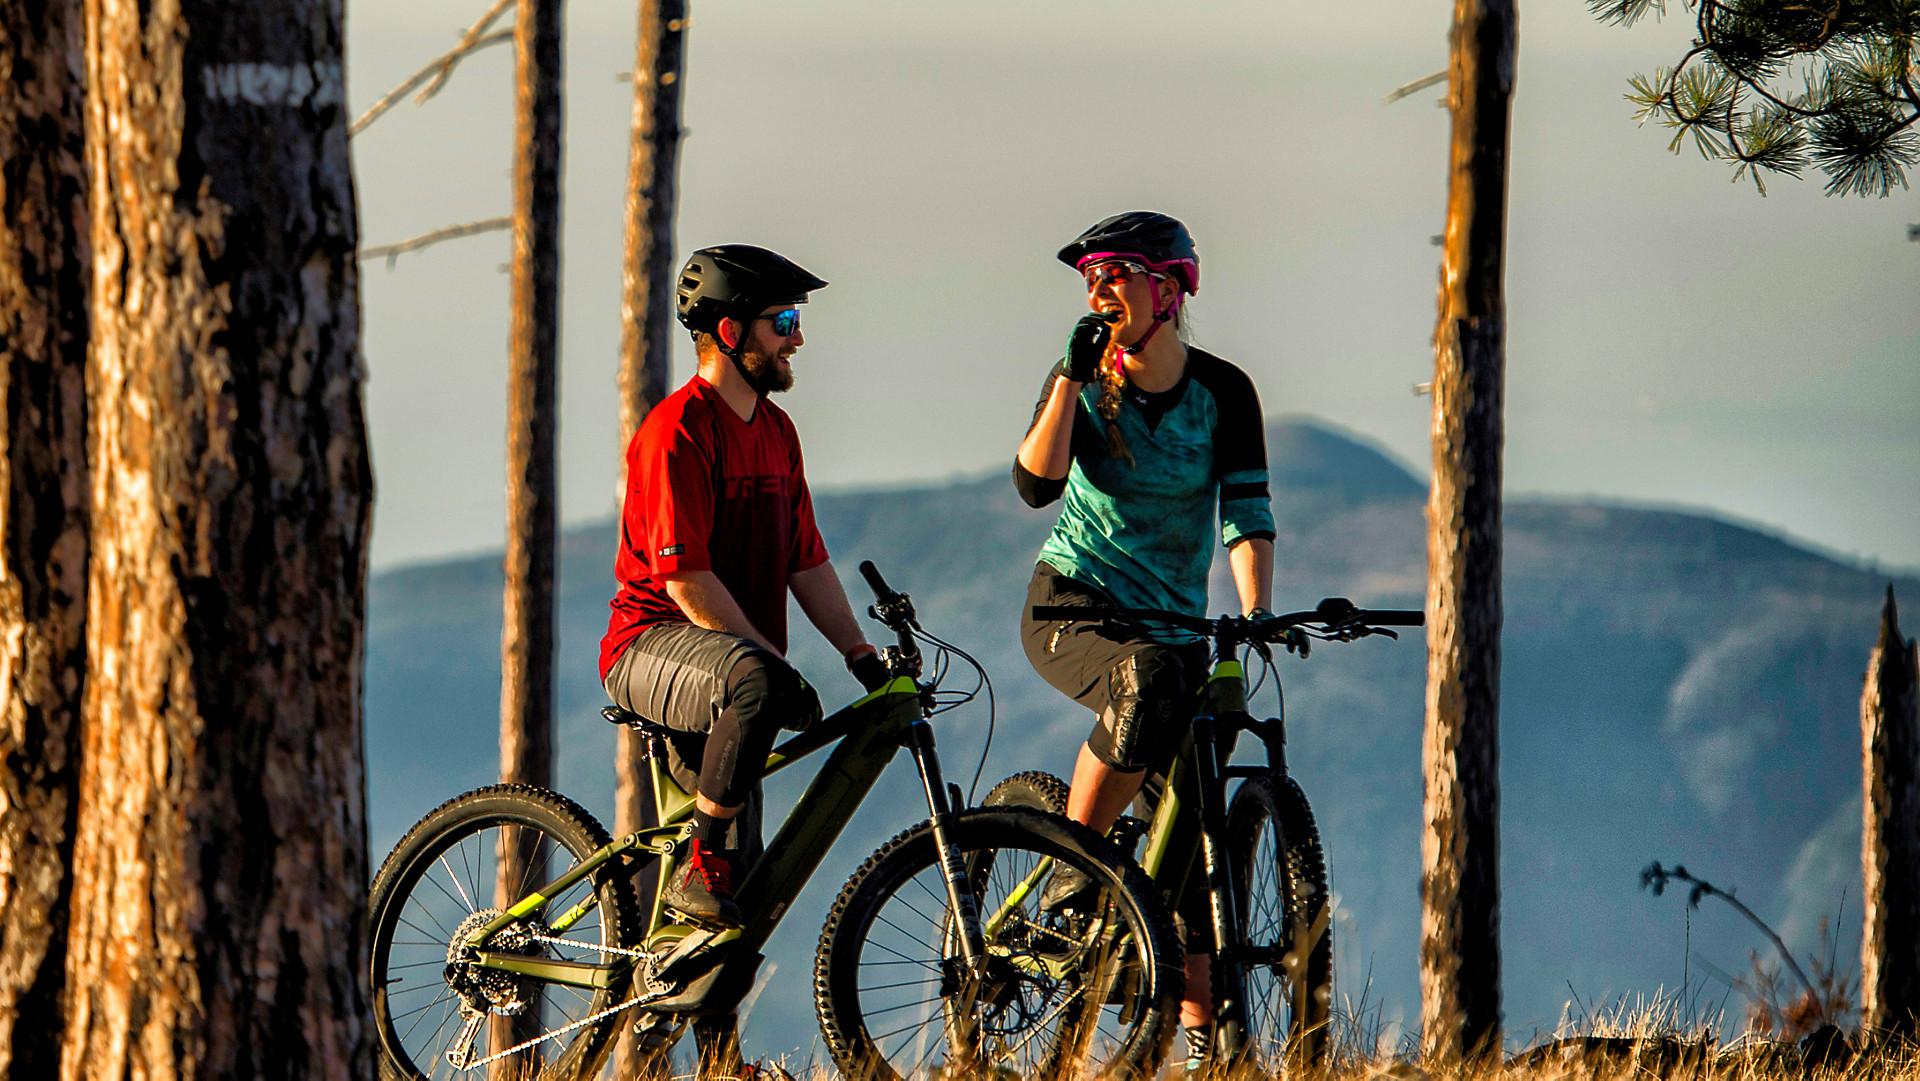 fd0d9101787 Trek e-bike overview | Trek Bikes (CA)